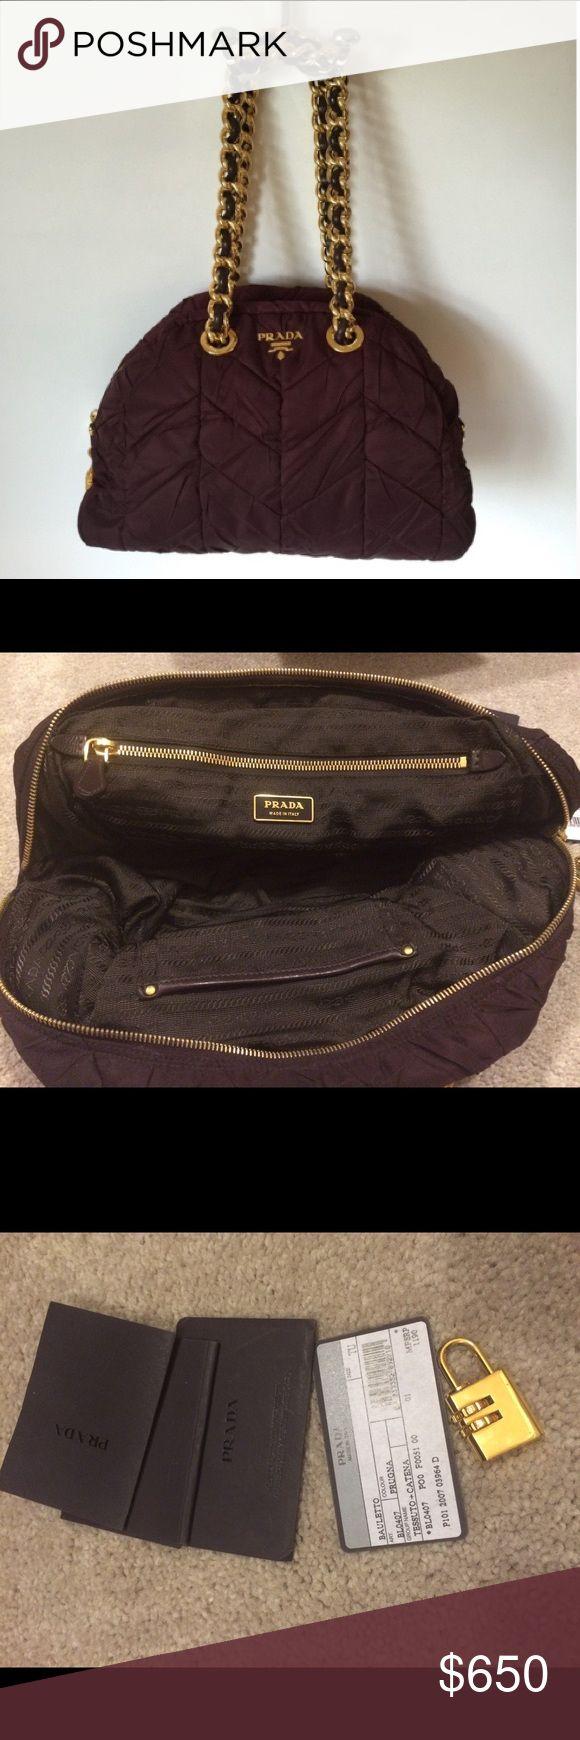 Prada Catena Chevron Tessuto Large Plum Satchel Plum colored satchel. Used once. No damage. Willing to negotiate. Prada Bags